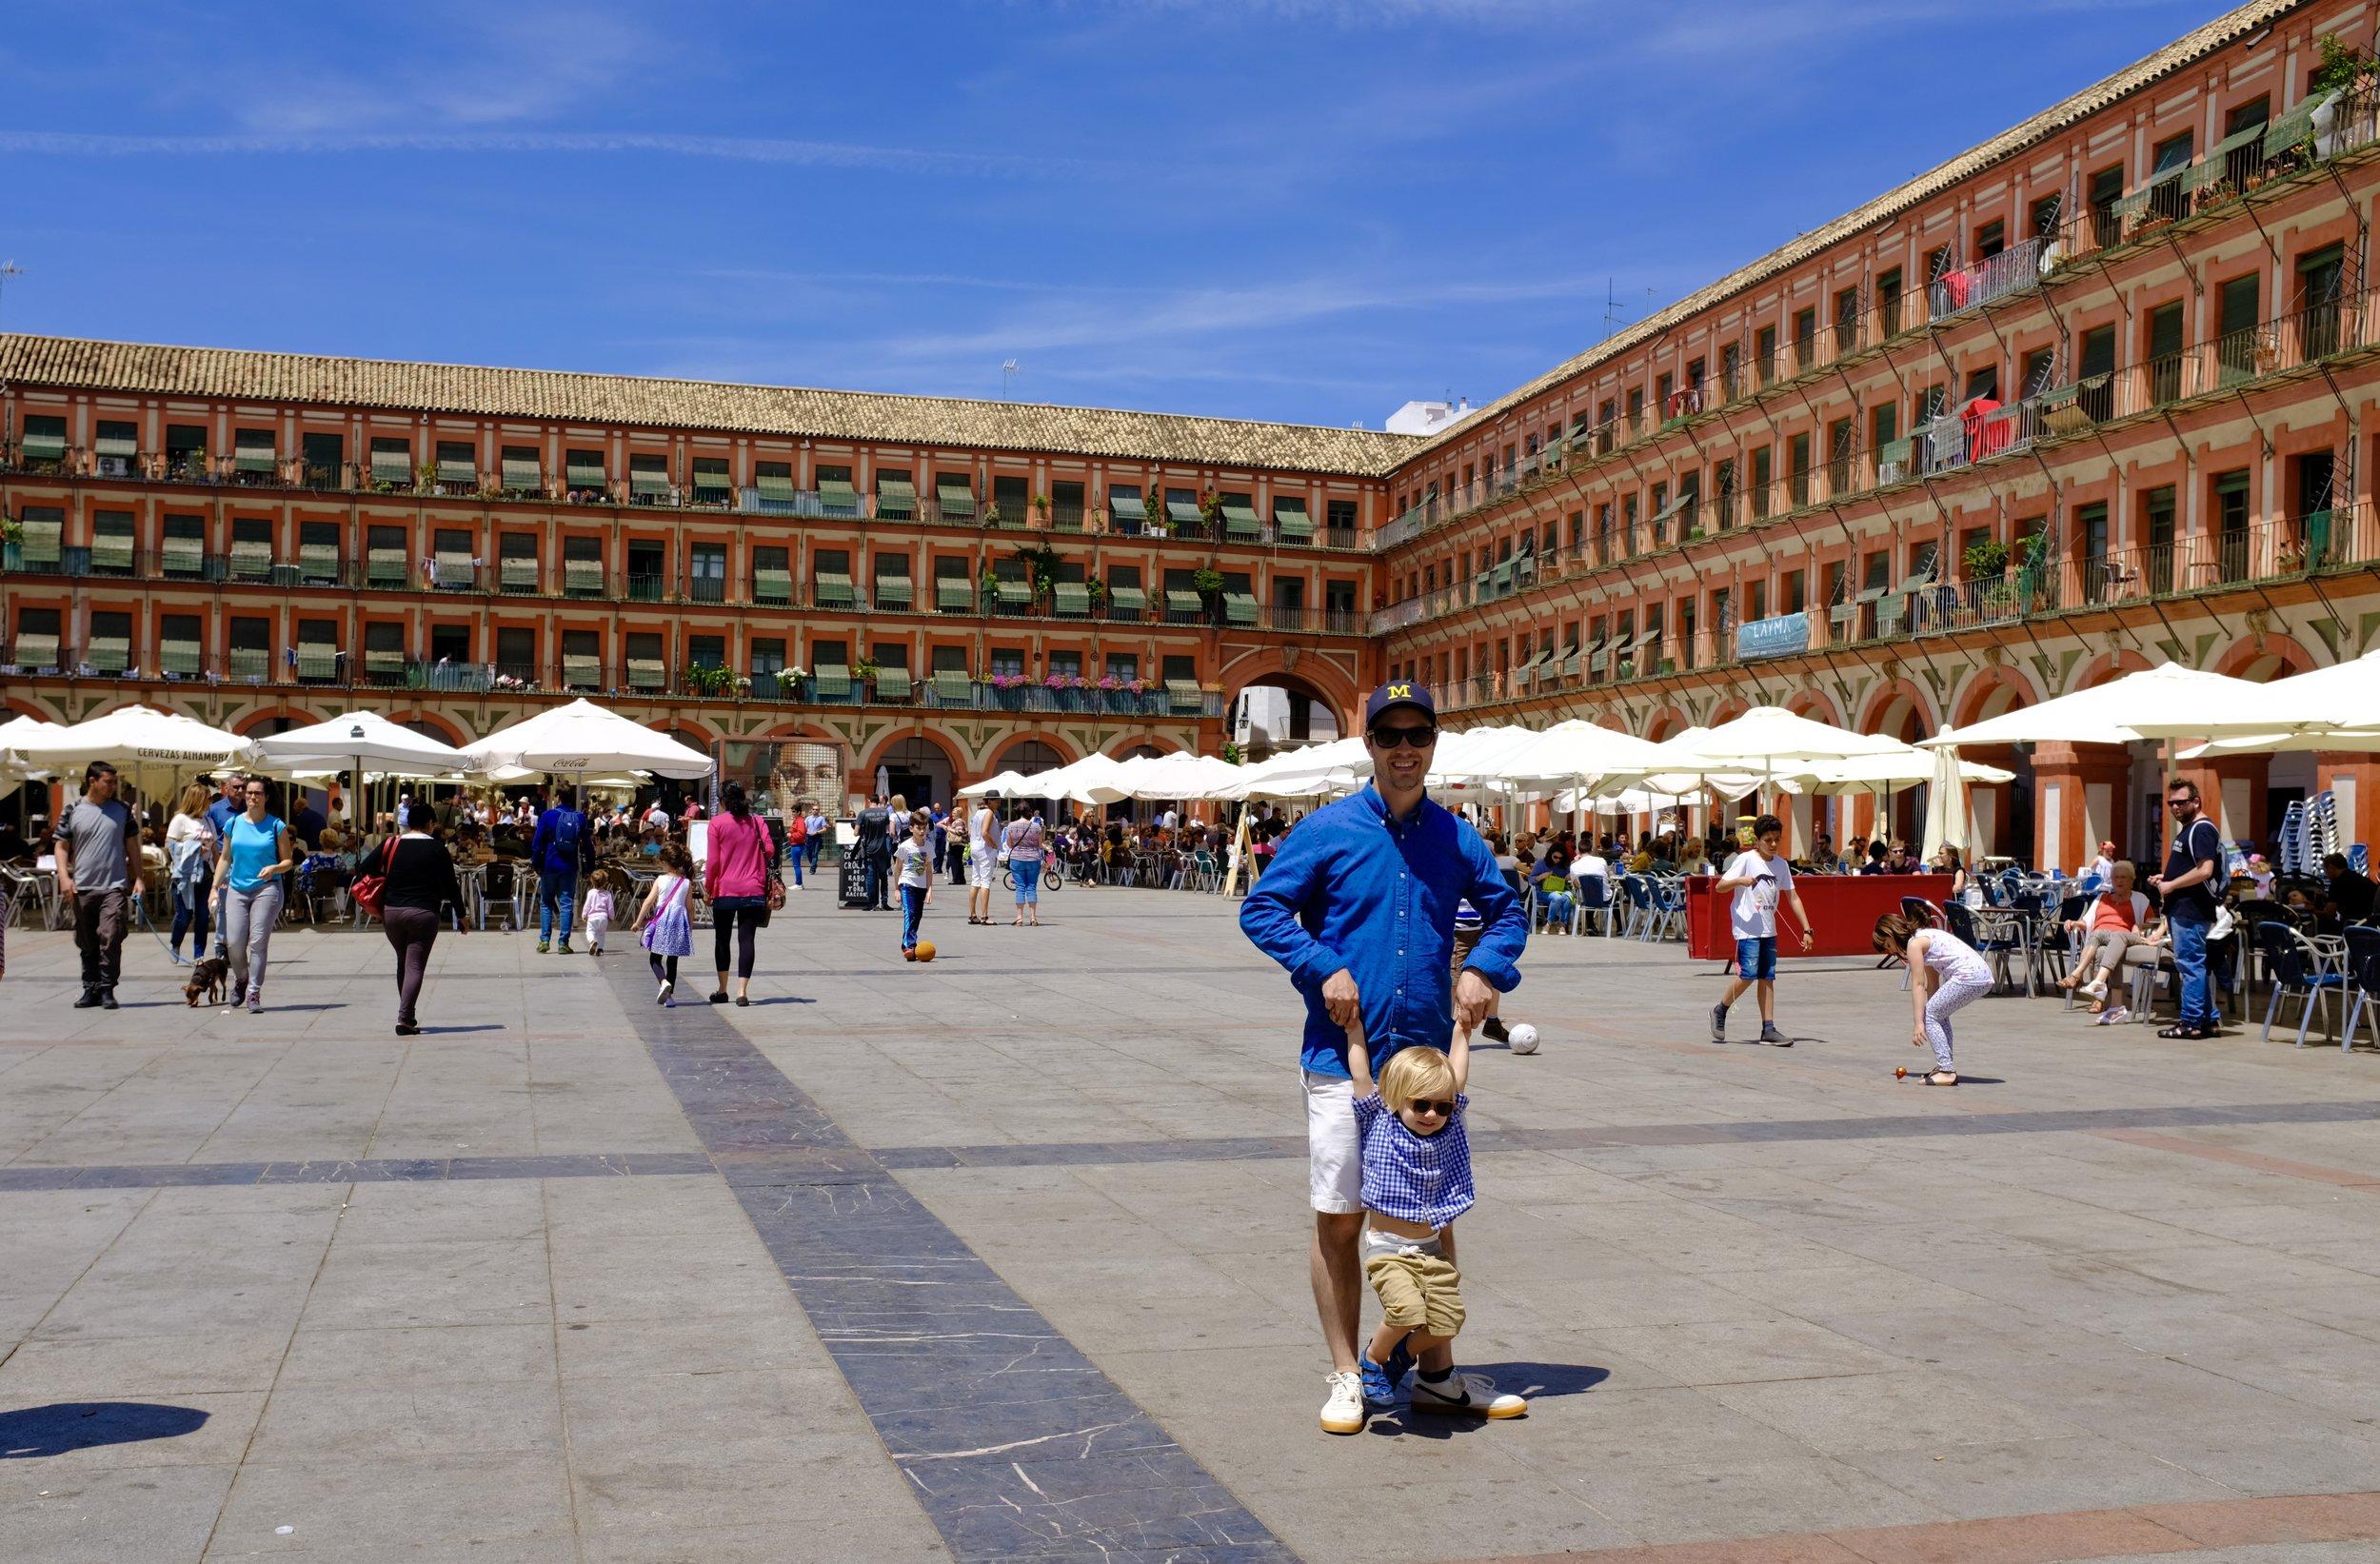 Plaza de la Corredera_City Nibbler_Córdoba Spain